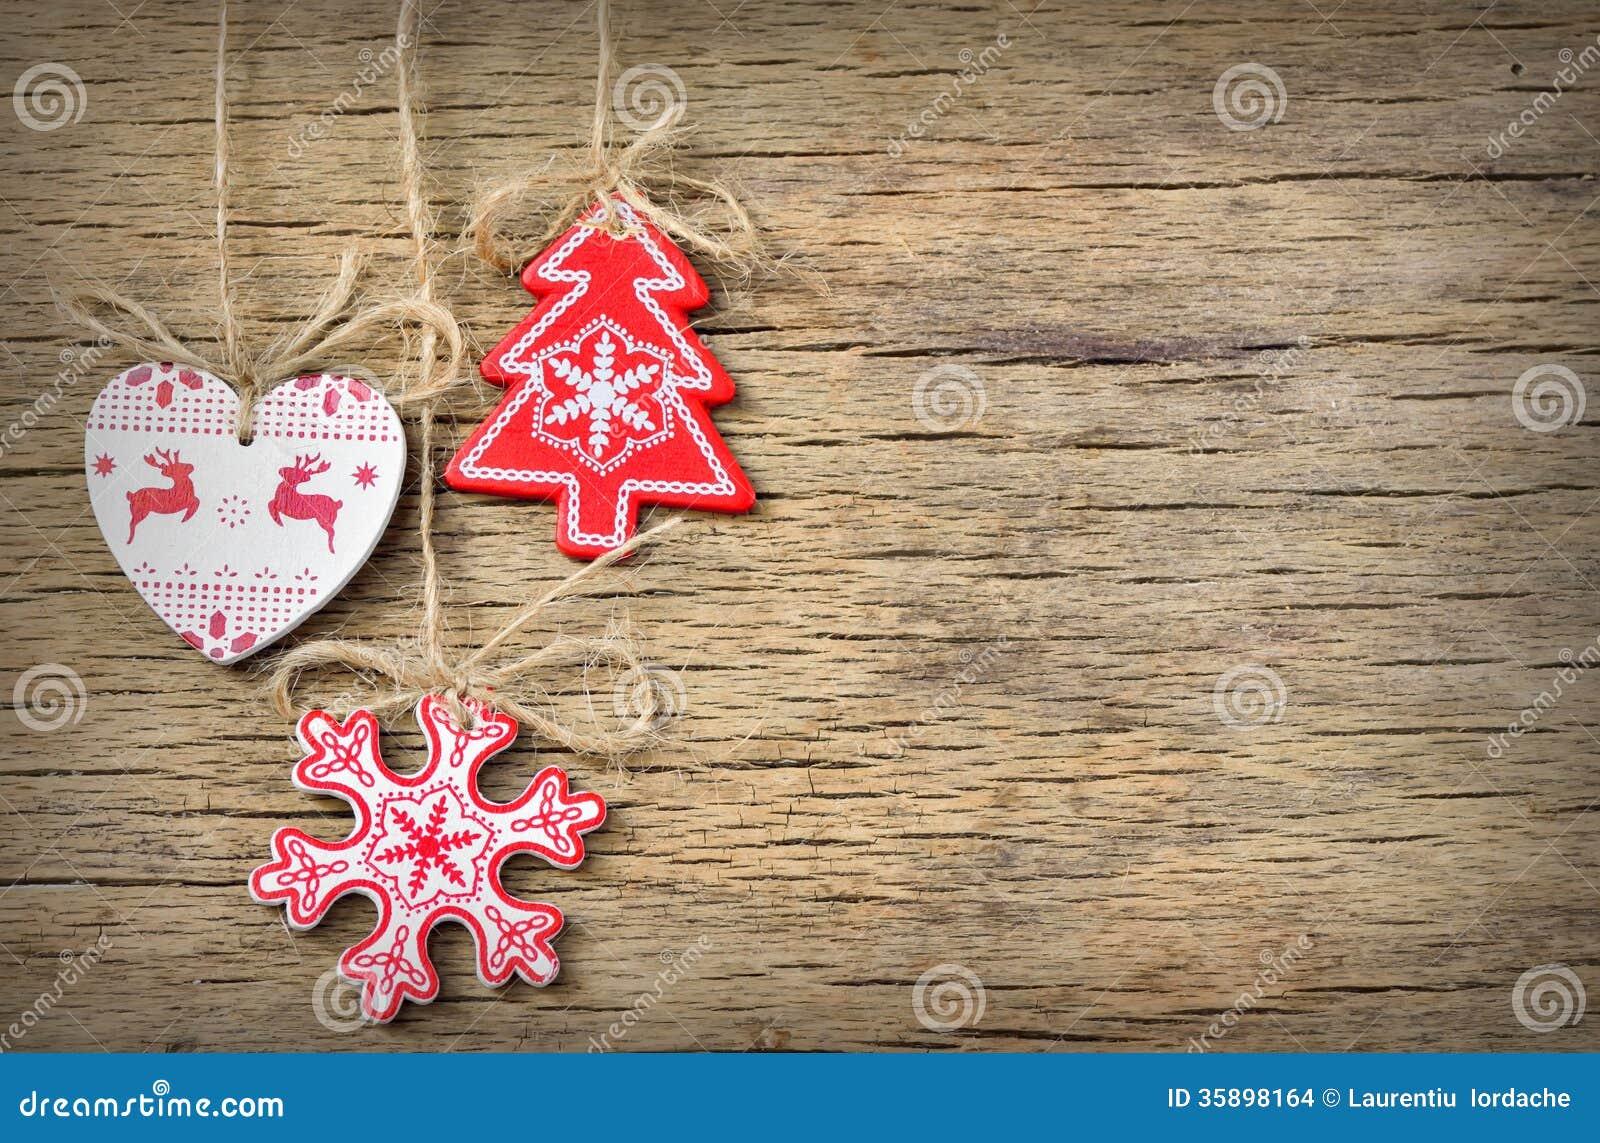 rustic christmas wallpaper craft - photo #6